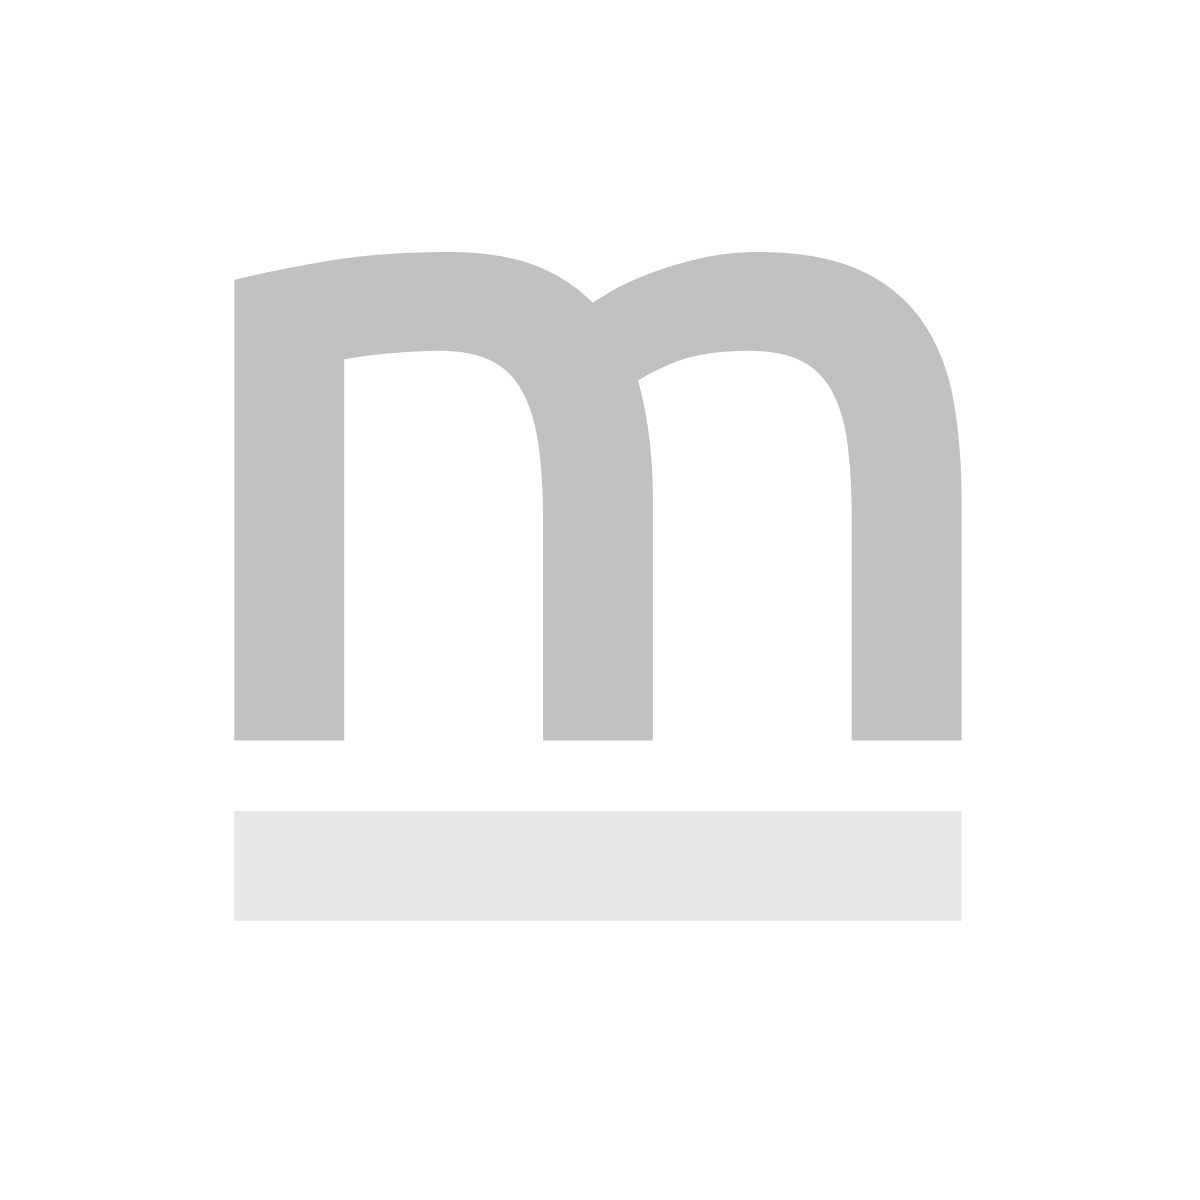 Krzesło CLAUDINE 1 VELVET GOLD morskie